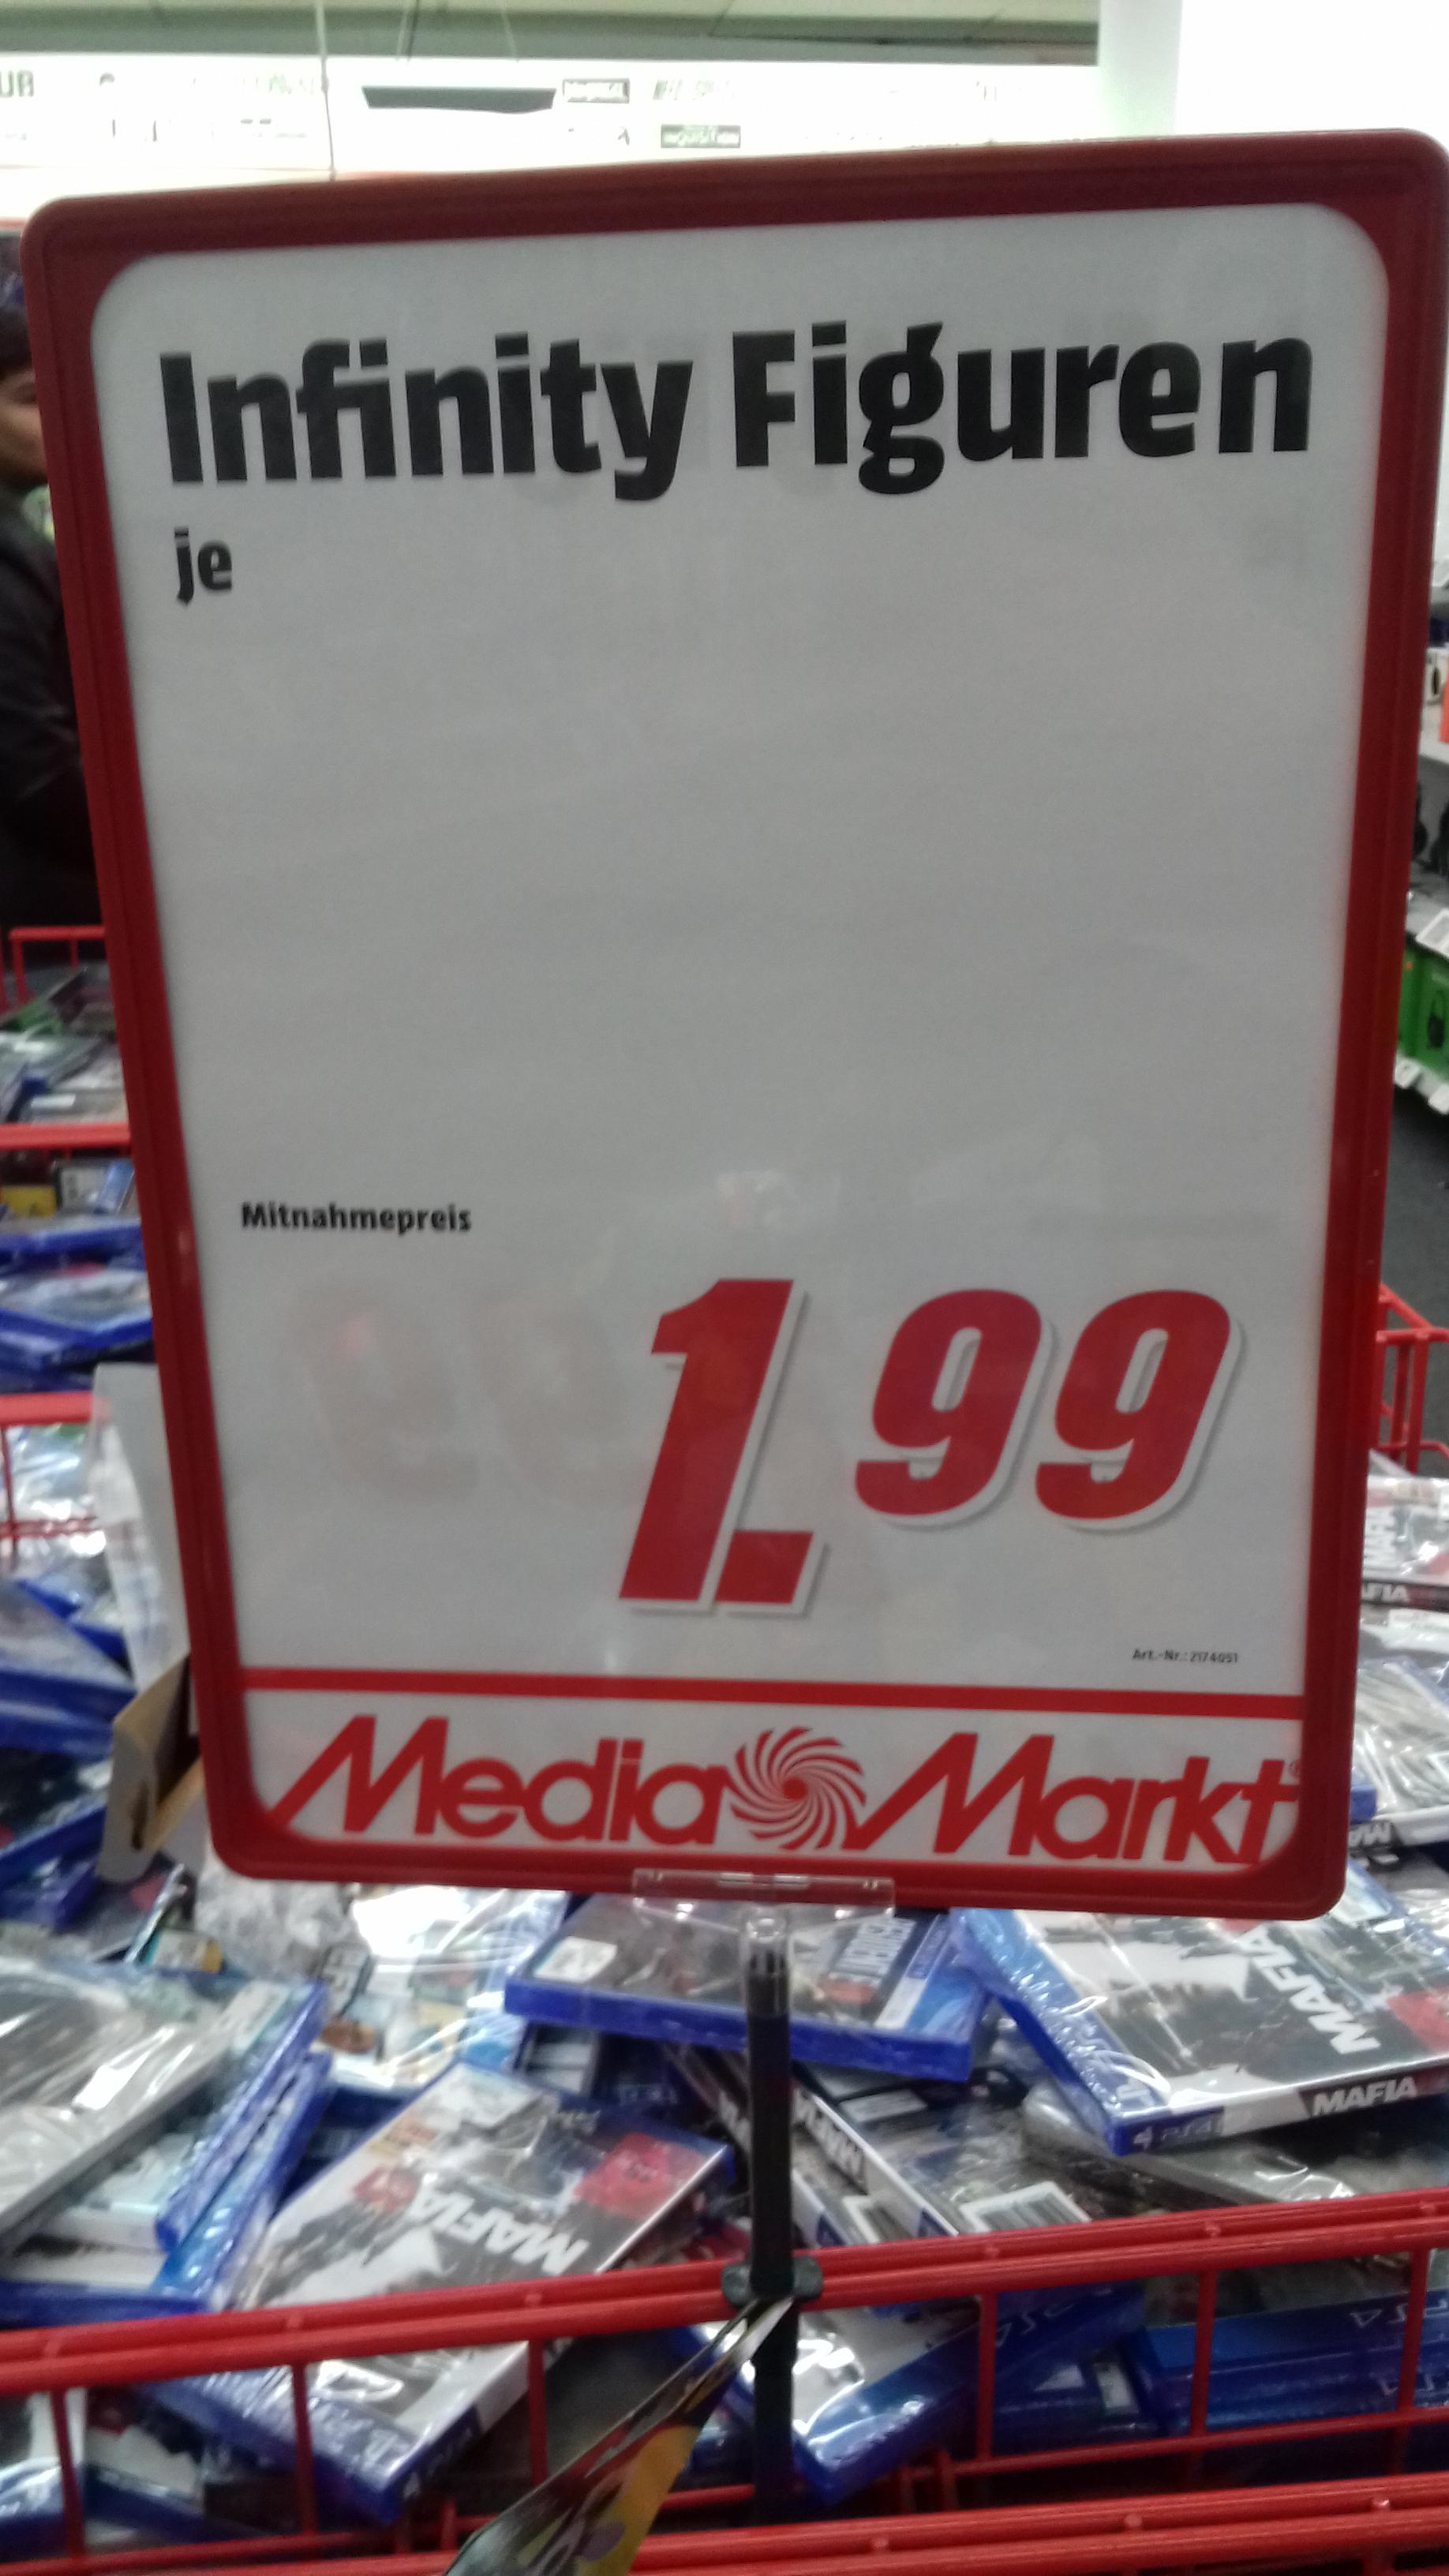 Verschiedene Disney  Infinity  Figuren für 1,99 Euro in Media Markt  Wilhelmshaven  (Lokal)